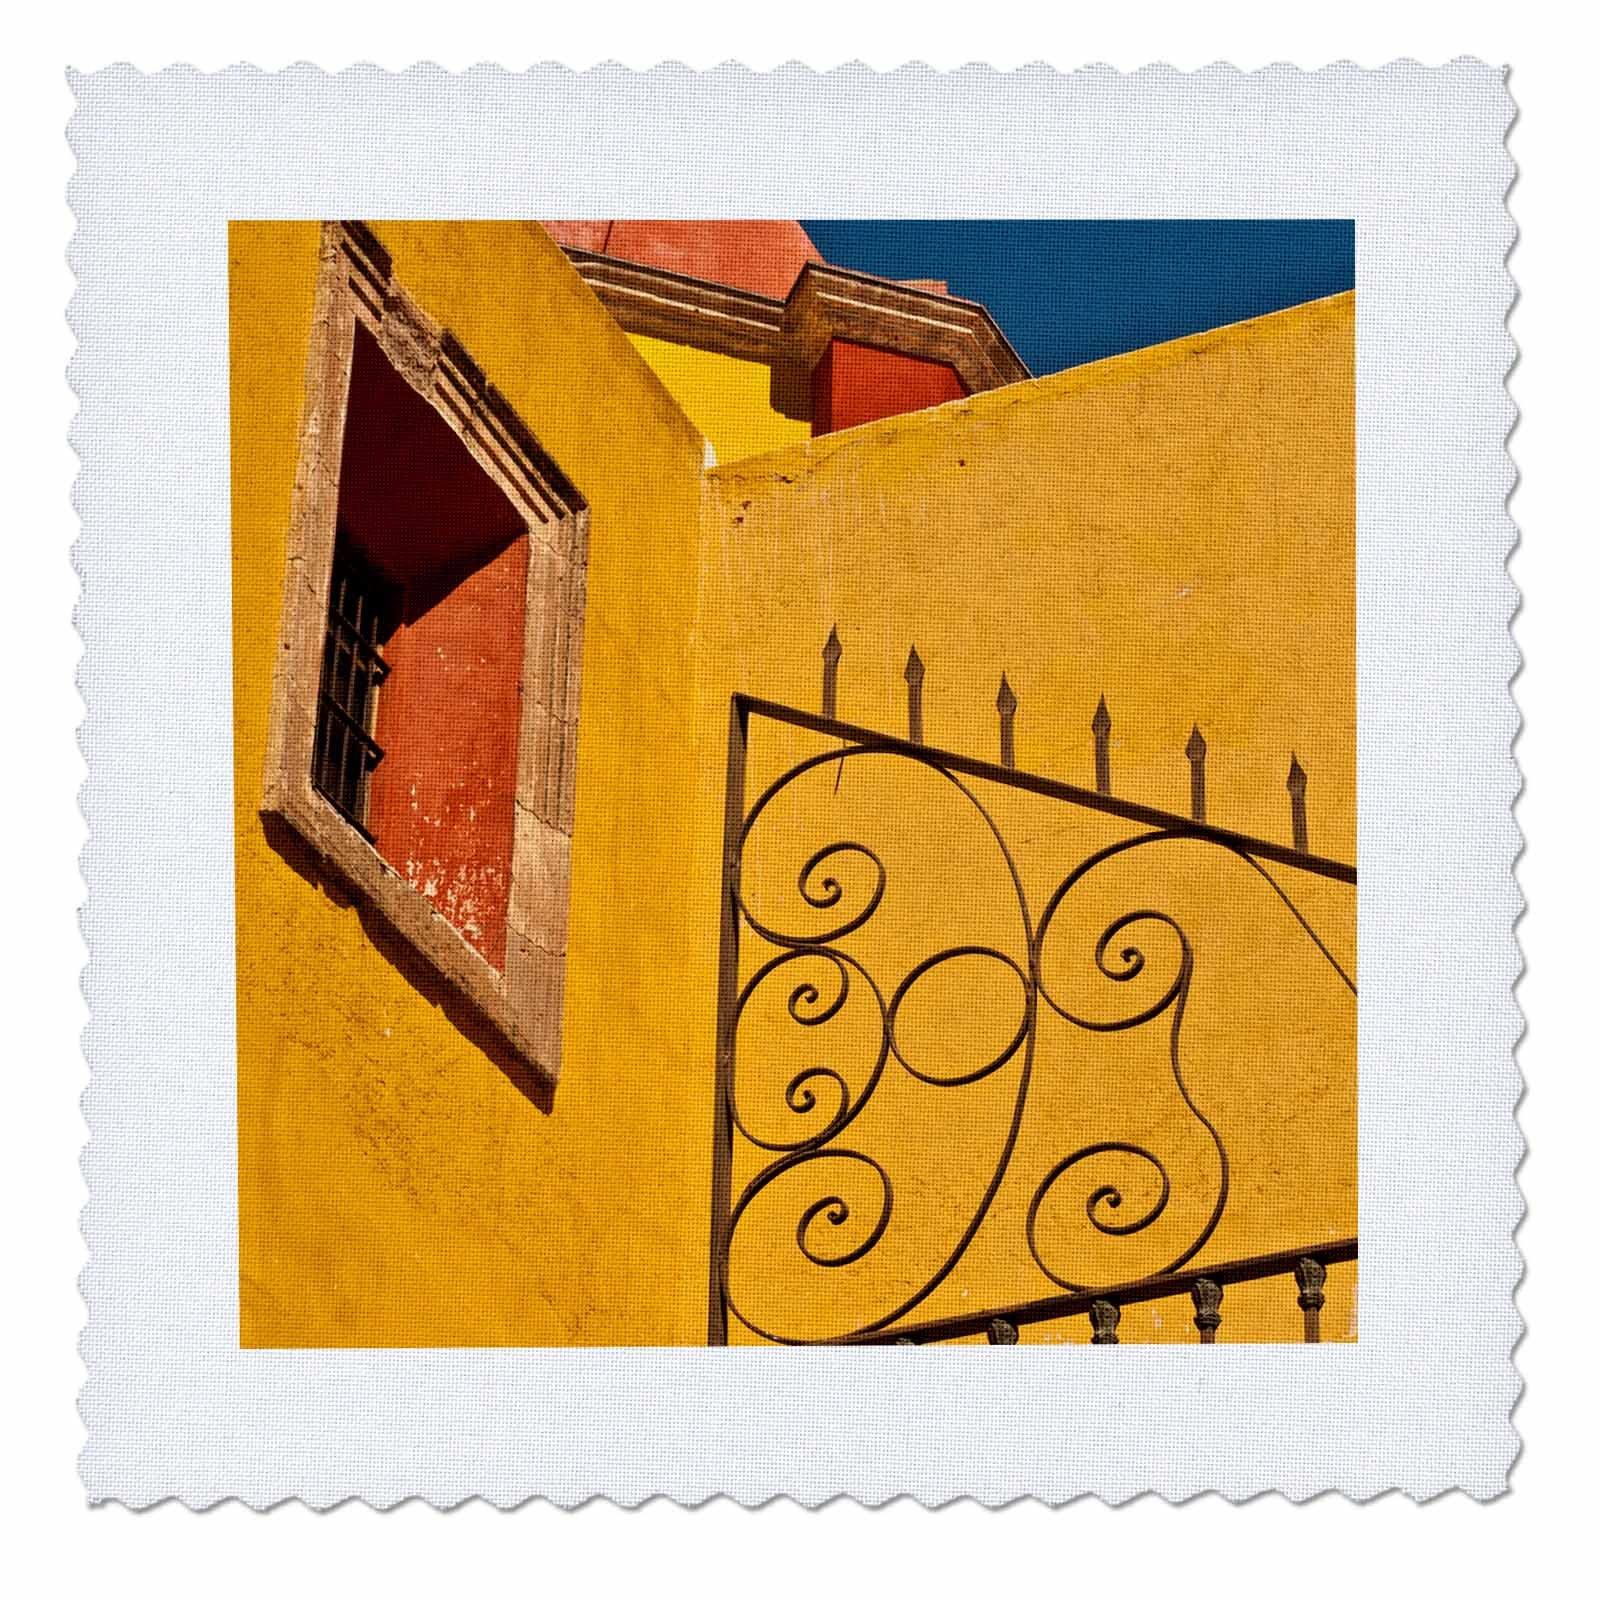 3dRose Danita Delimont - Architecture - Mexico, Guanajuato. Wrought iron fence against a yellow church. - 18x18 inch quilt square (qs_258502_7)